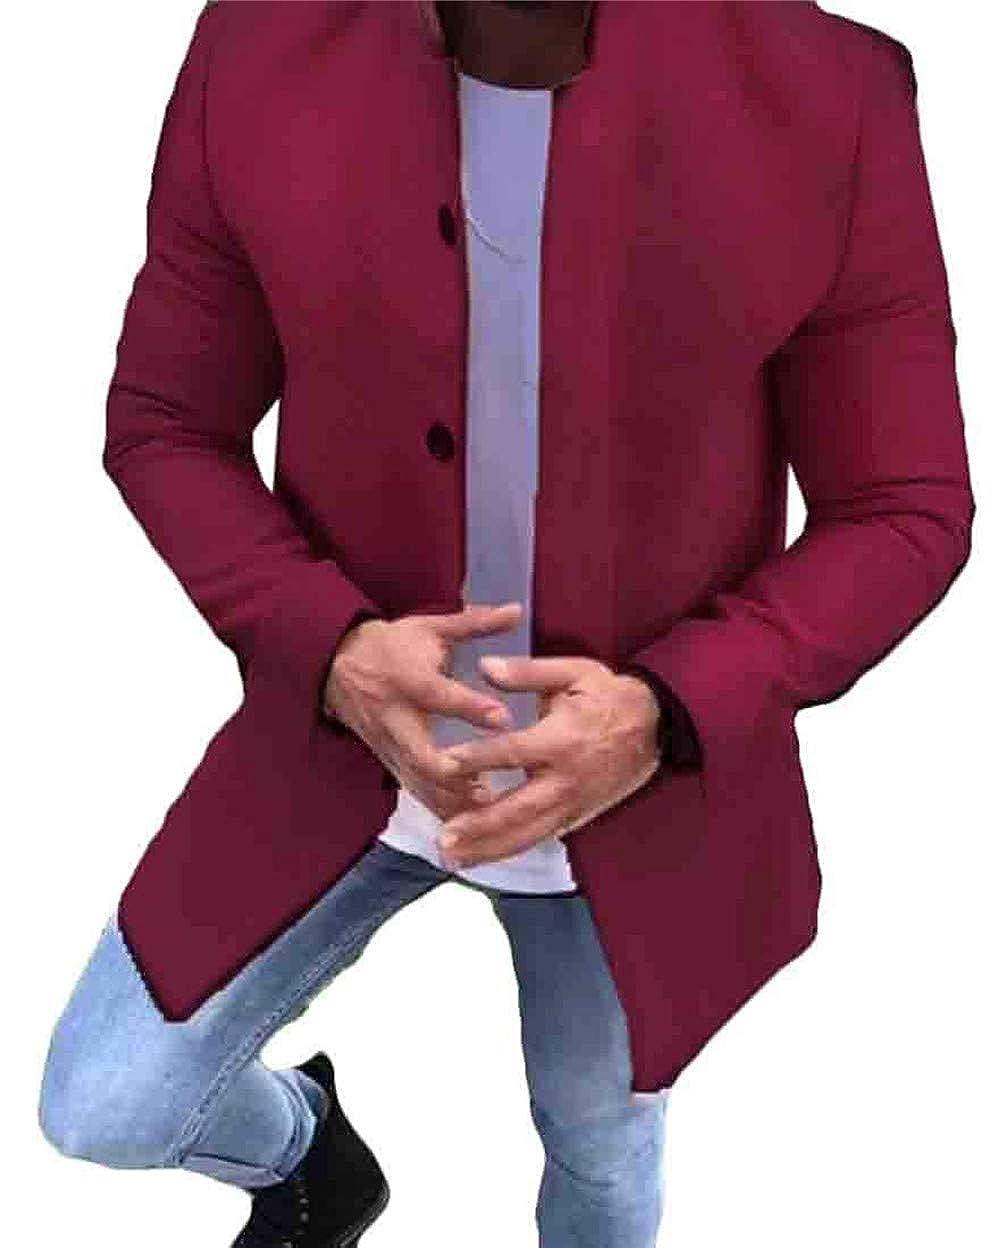 562fb5d66 WineRed Mhihll Men's Stand Collar Single Breasted Fashion Windbreaker  Windbreaker Windbreaker Long Jacket Coat 4b18a6